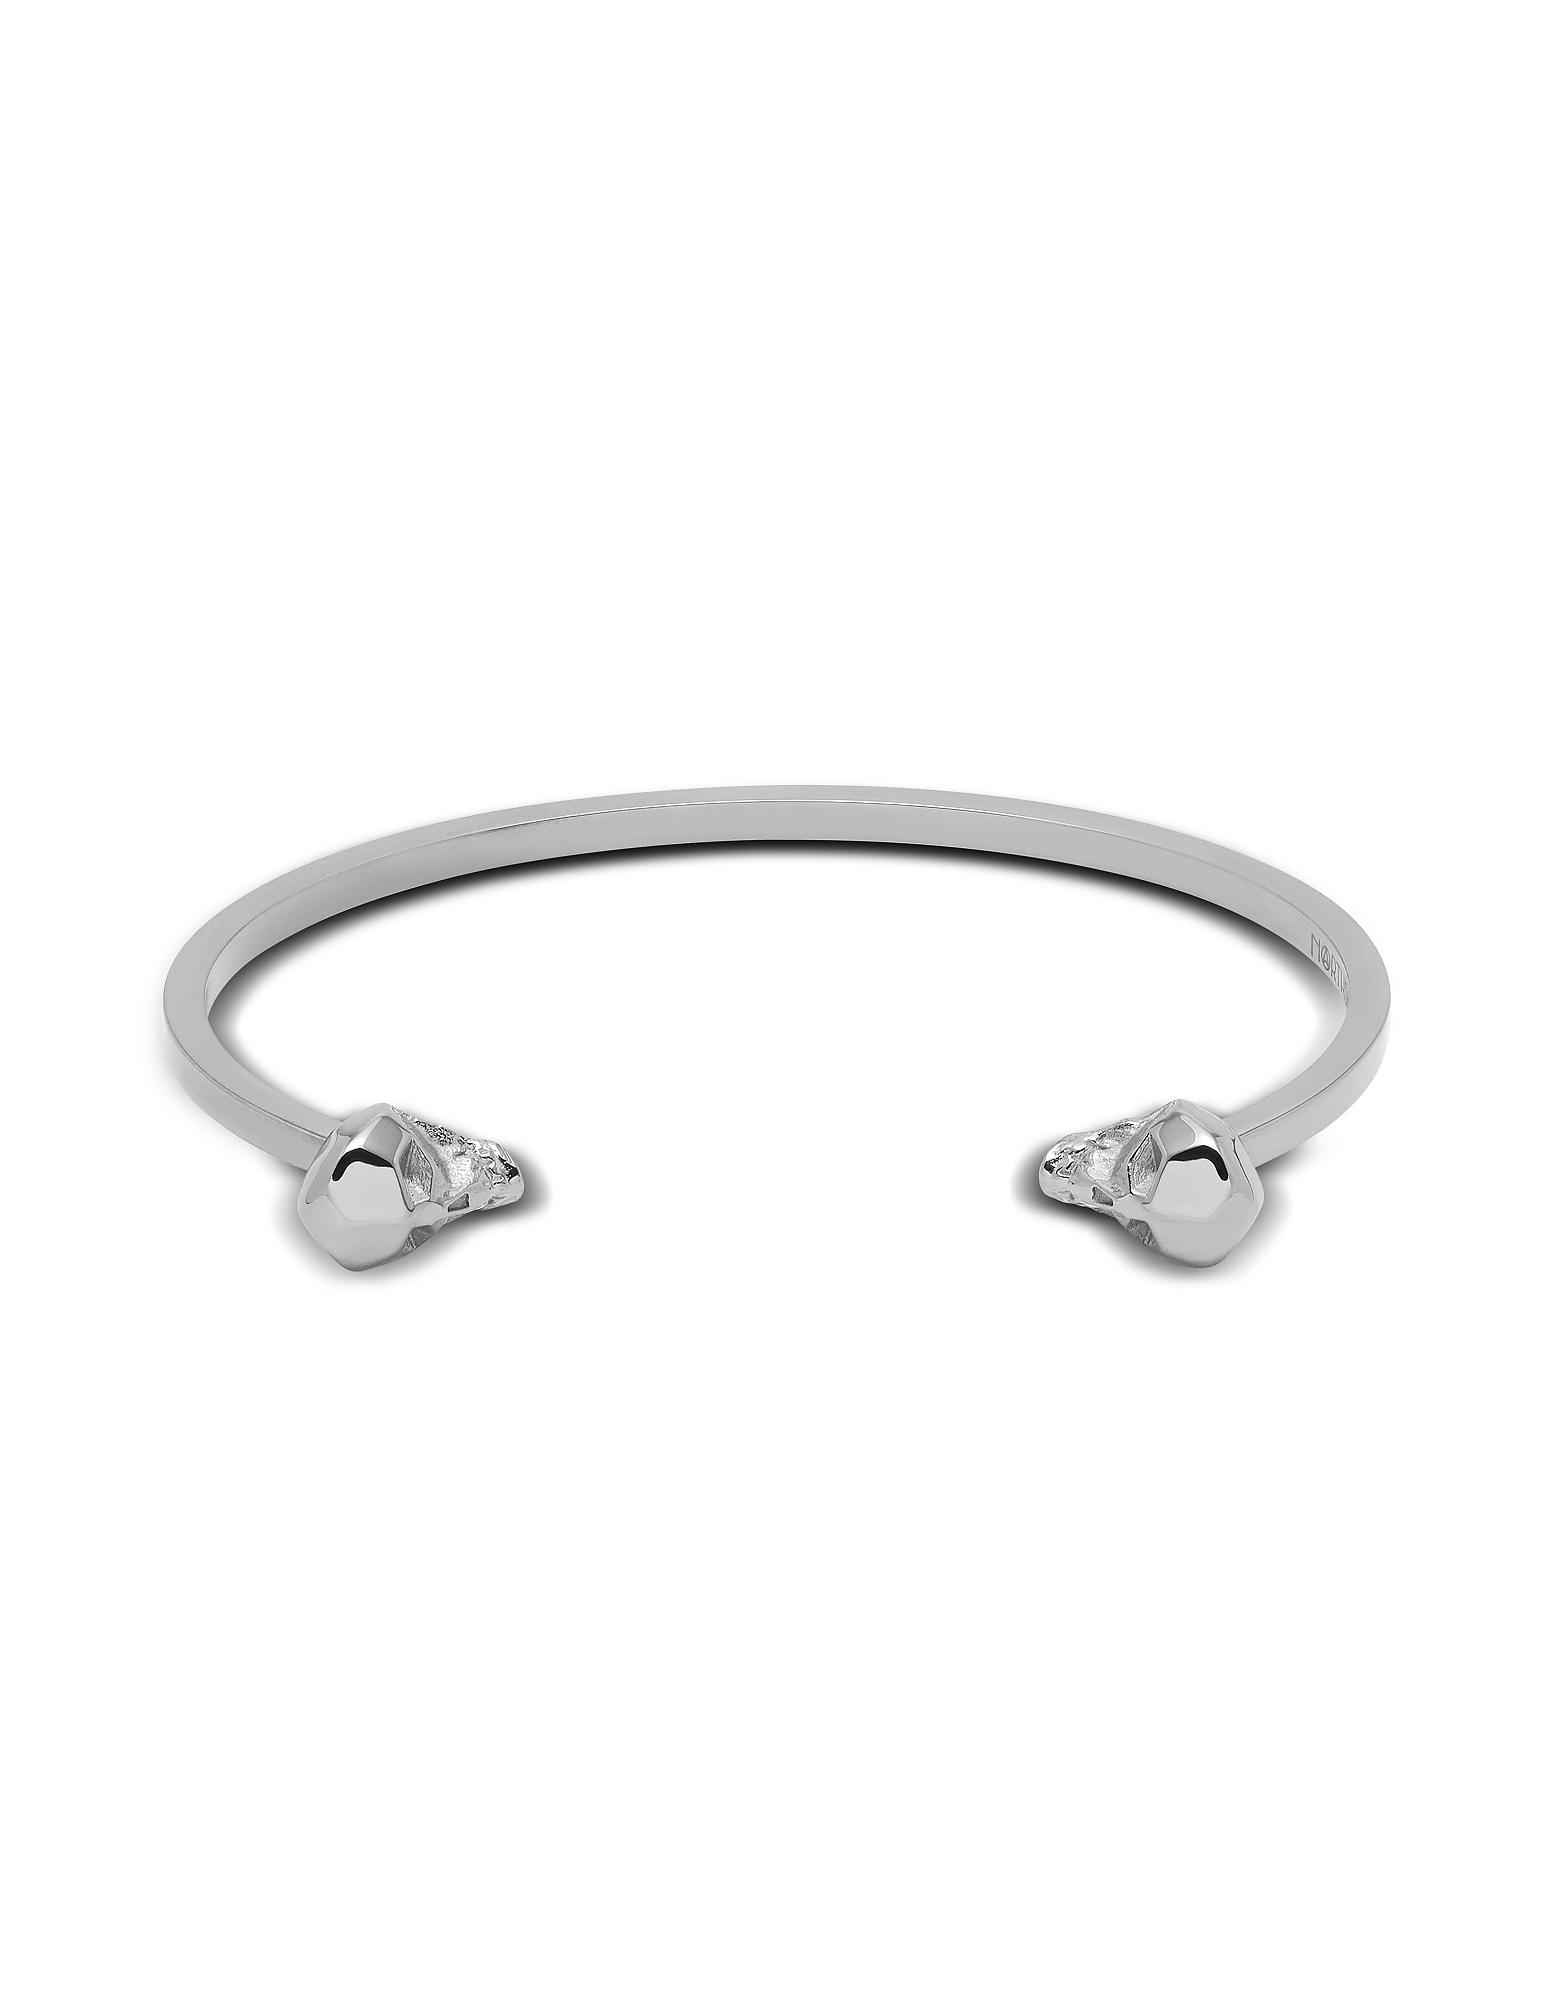 Northskull Men's Bracelets, Hexagus Skull Cuff In Silver